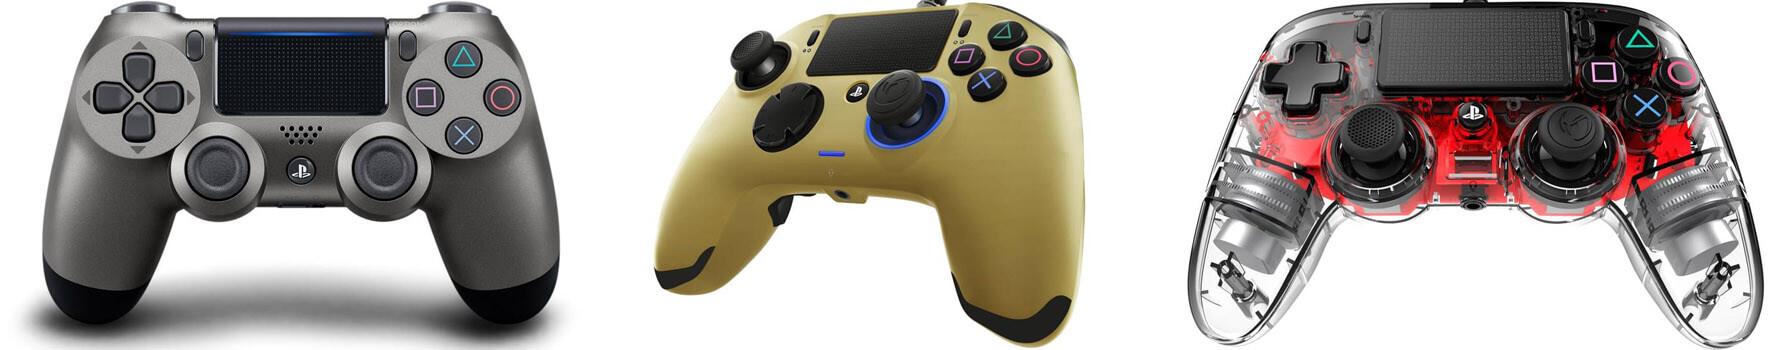 PS4 Controller: Sondereditionen